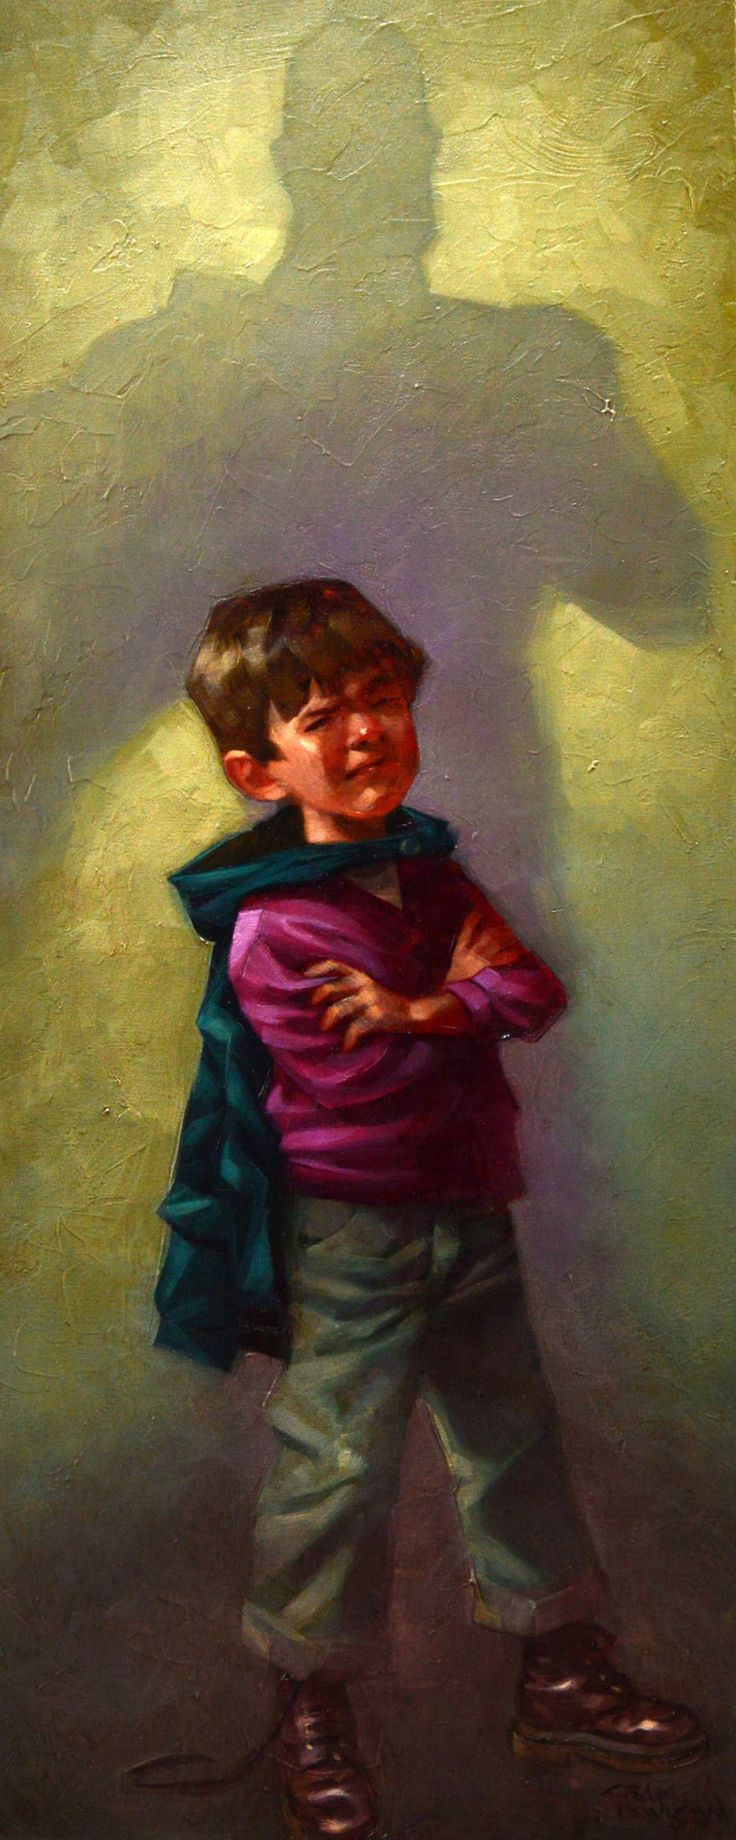 Superhero Kids: Need a Hero by Craig Davison *